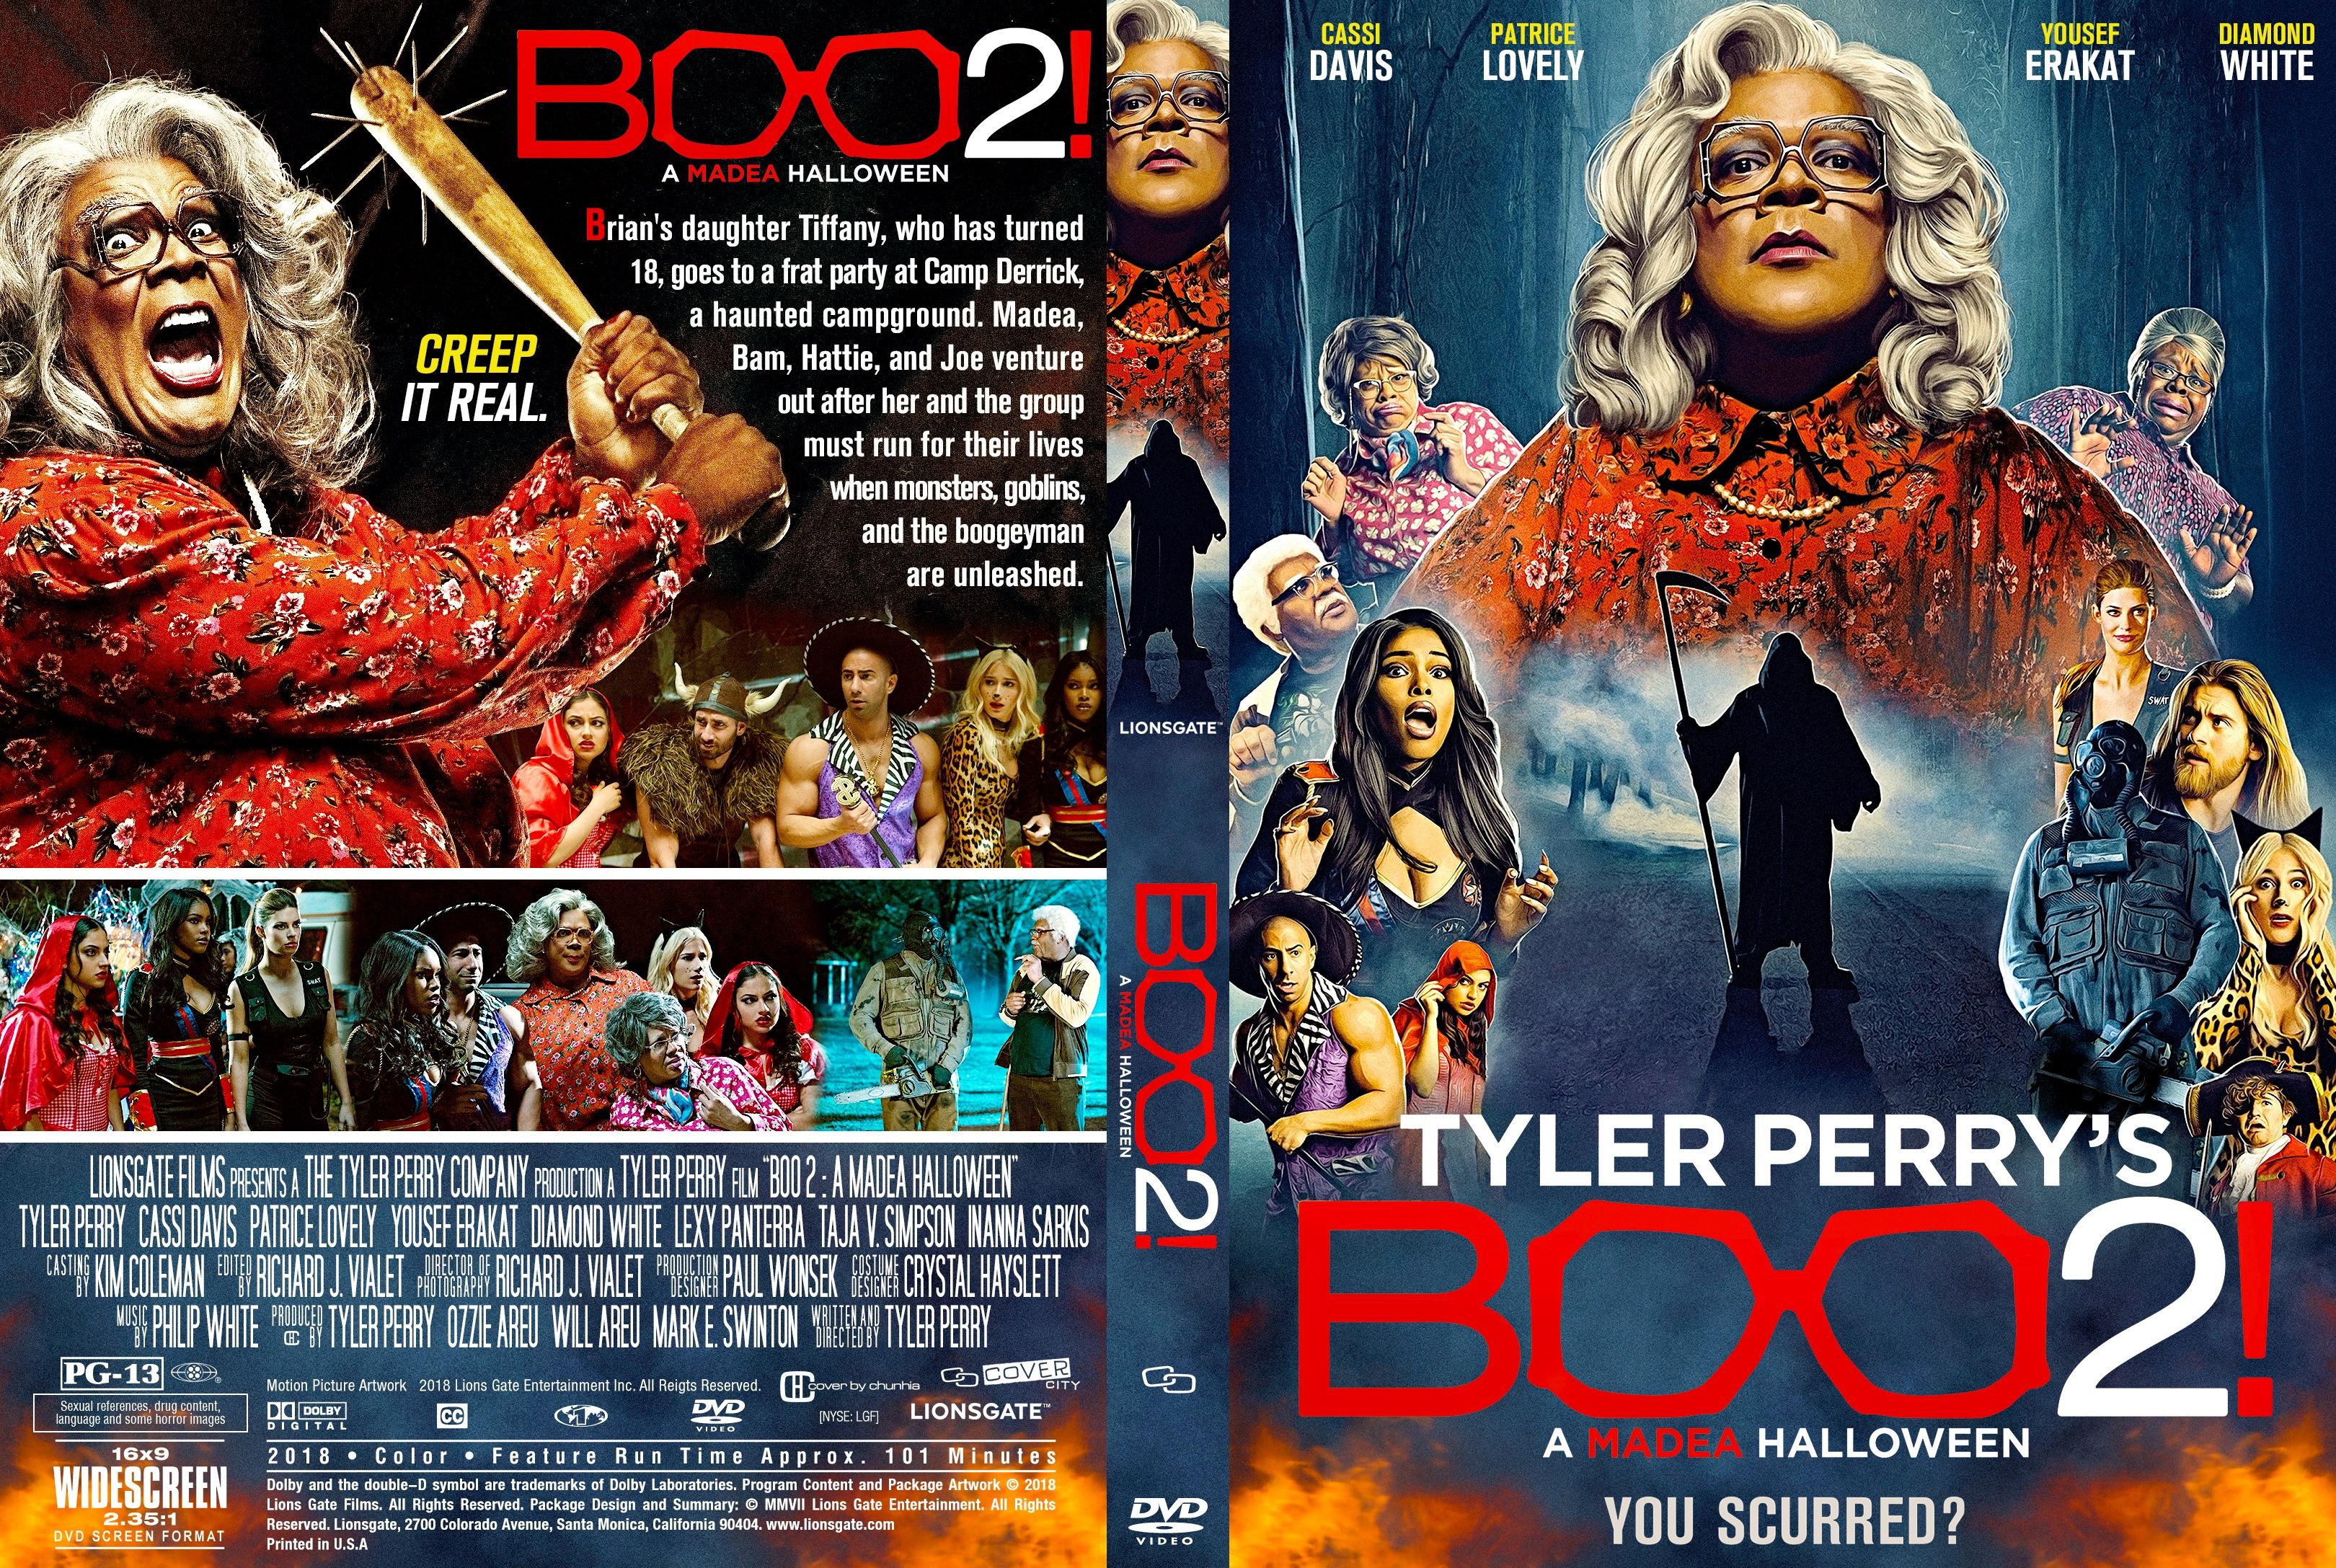 a madea halloween dvd cover